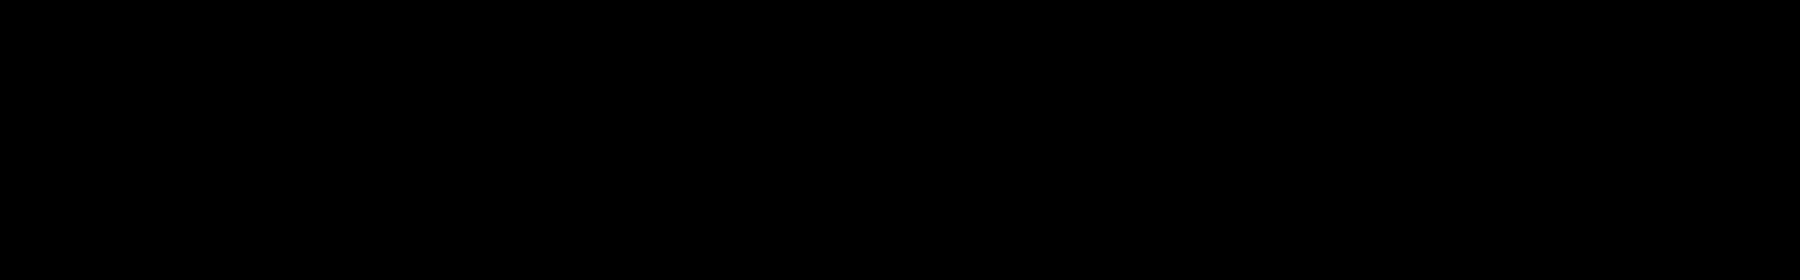 Analog Pad Loops audio waveform